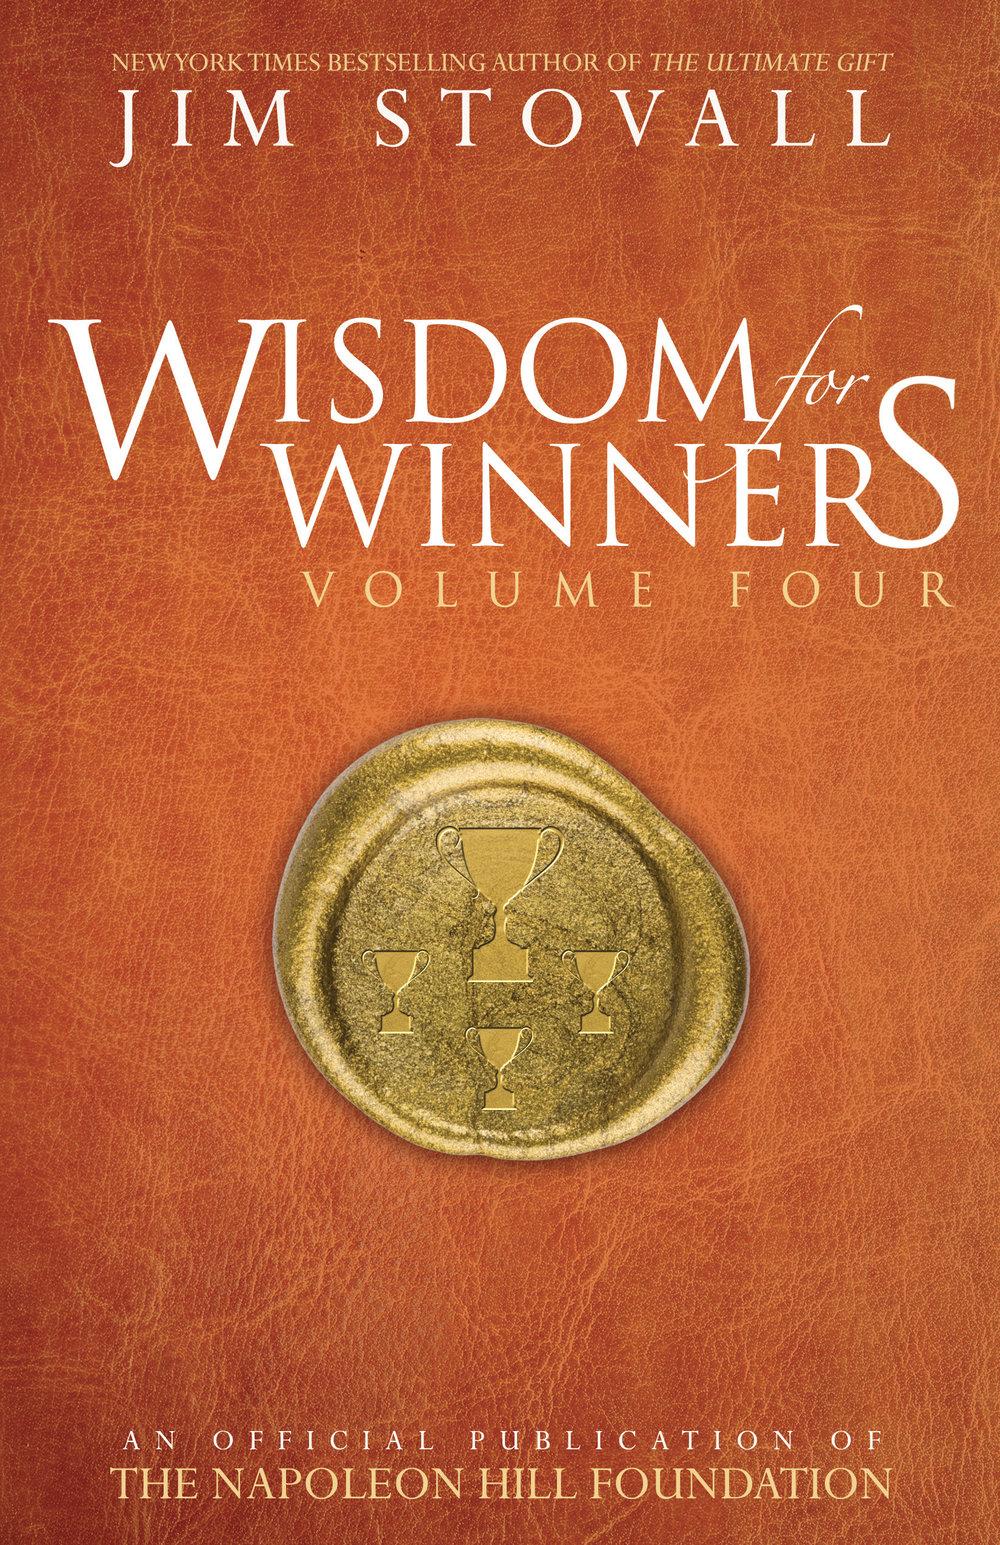 Wisdom_for_Winners_Volume_4.jpg